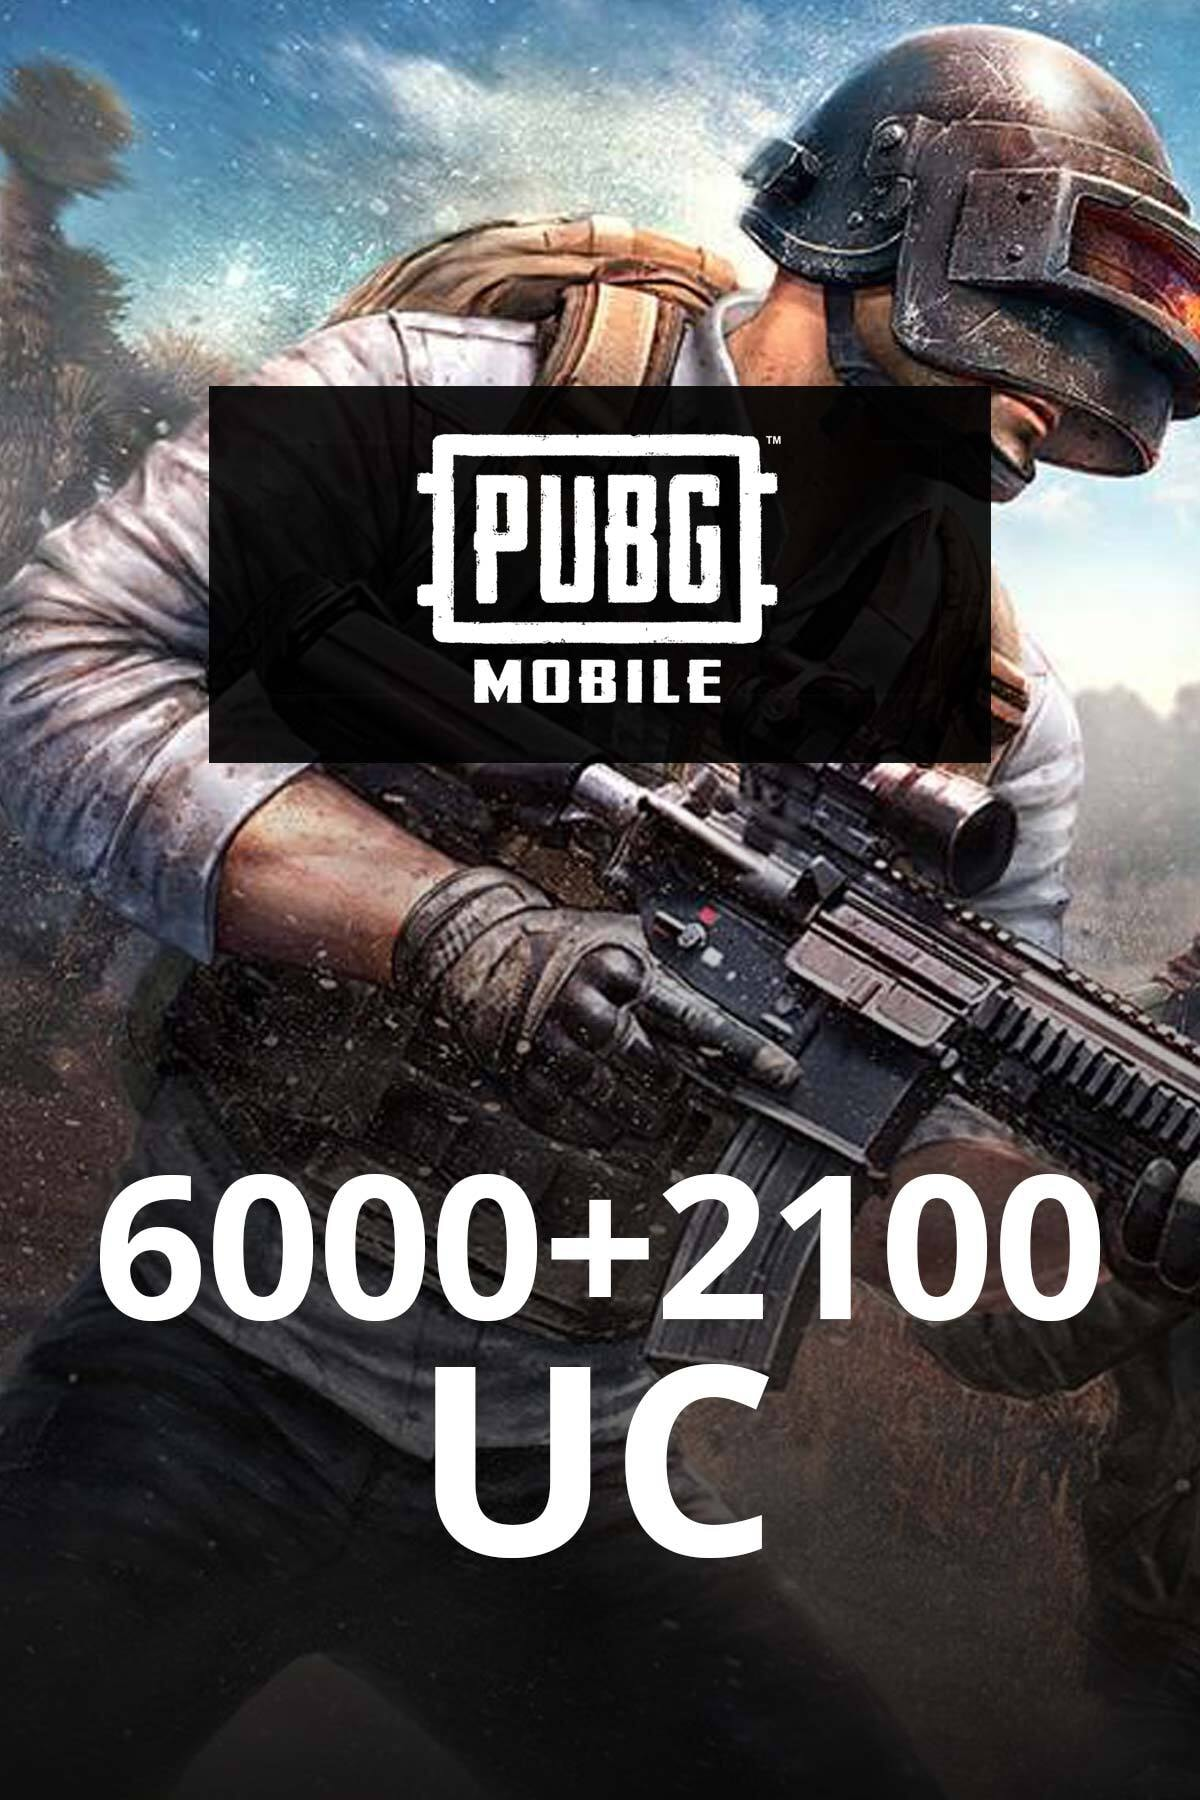 Mobile 6000 +2100 UC